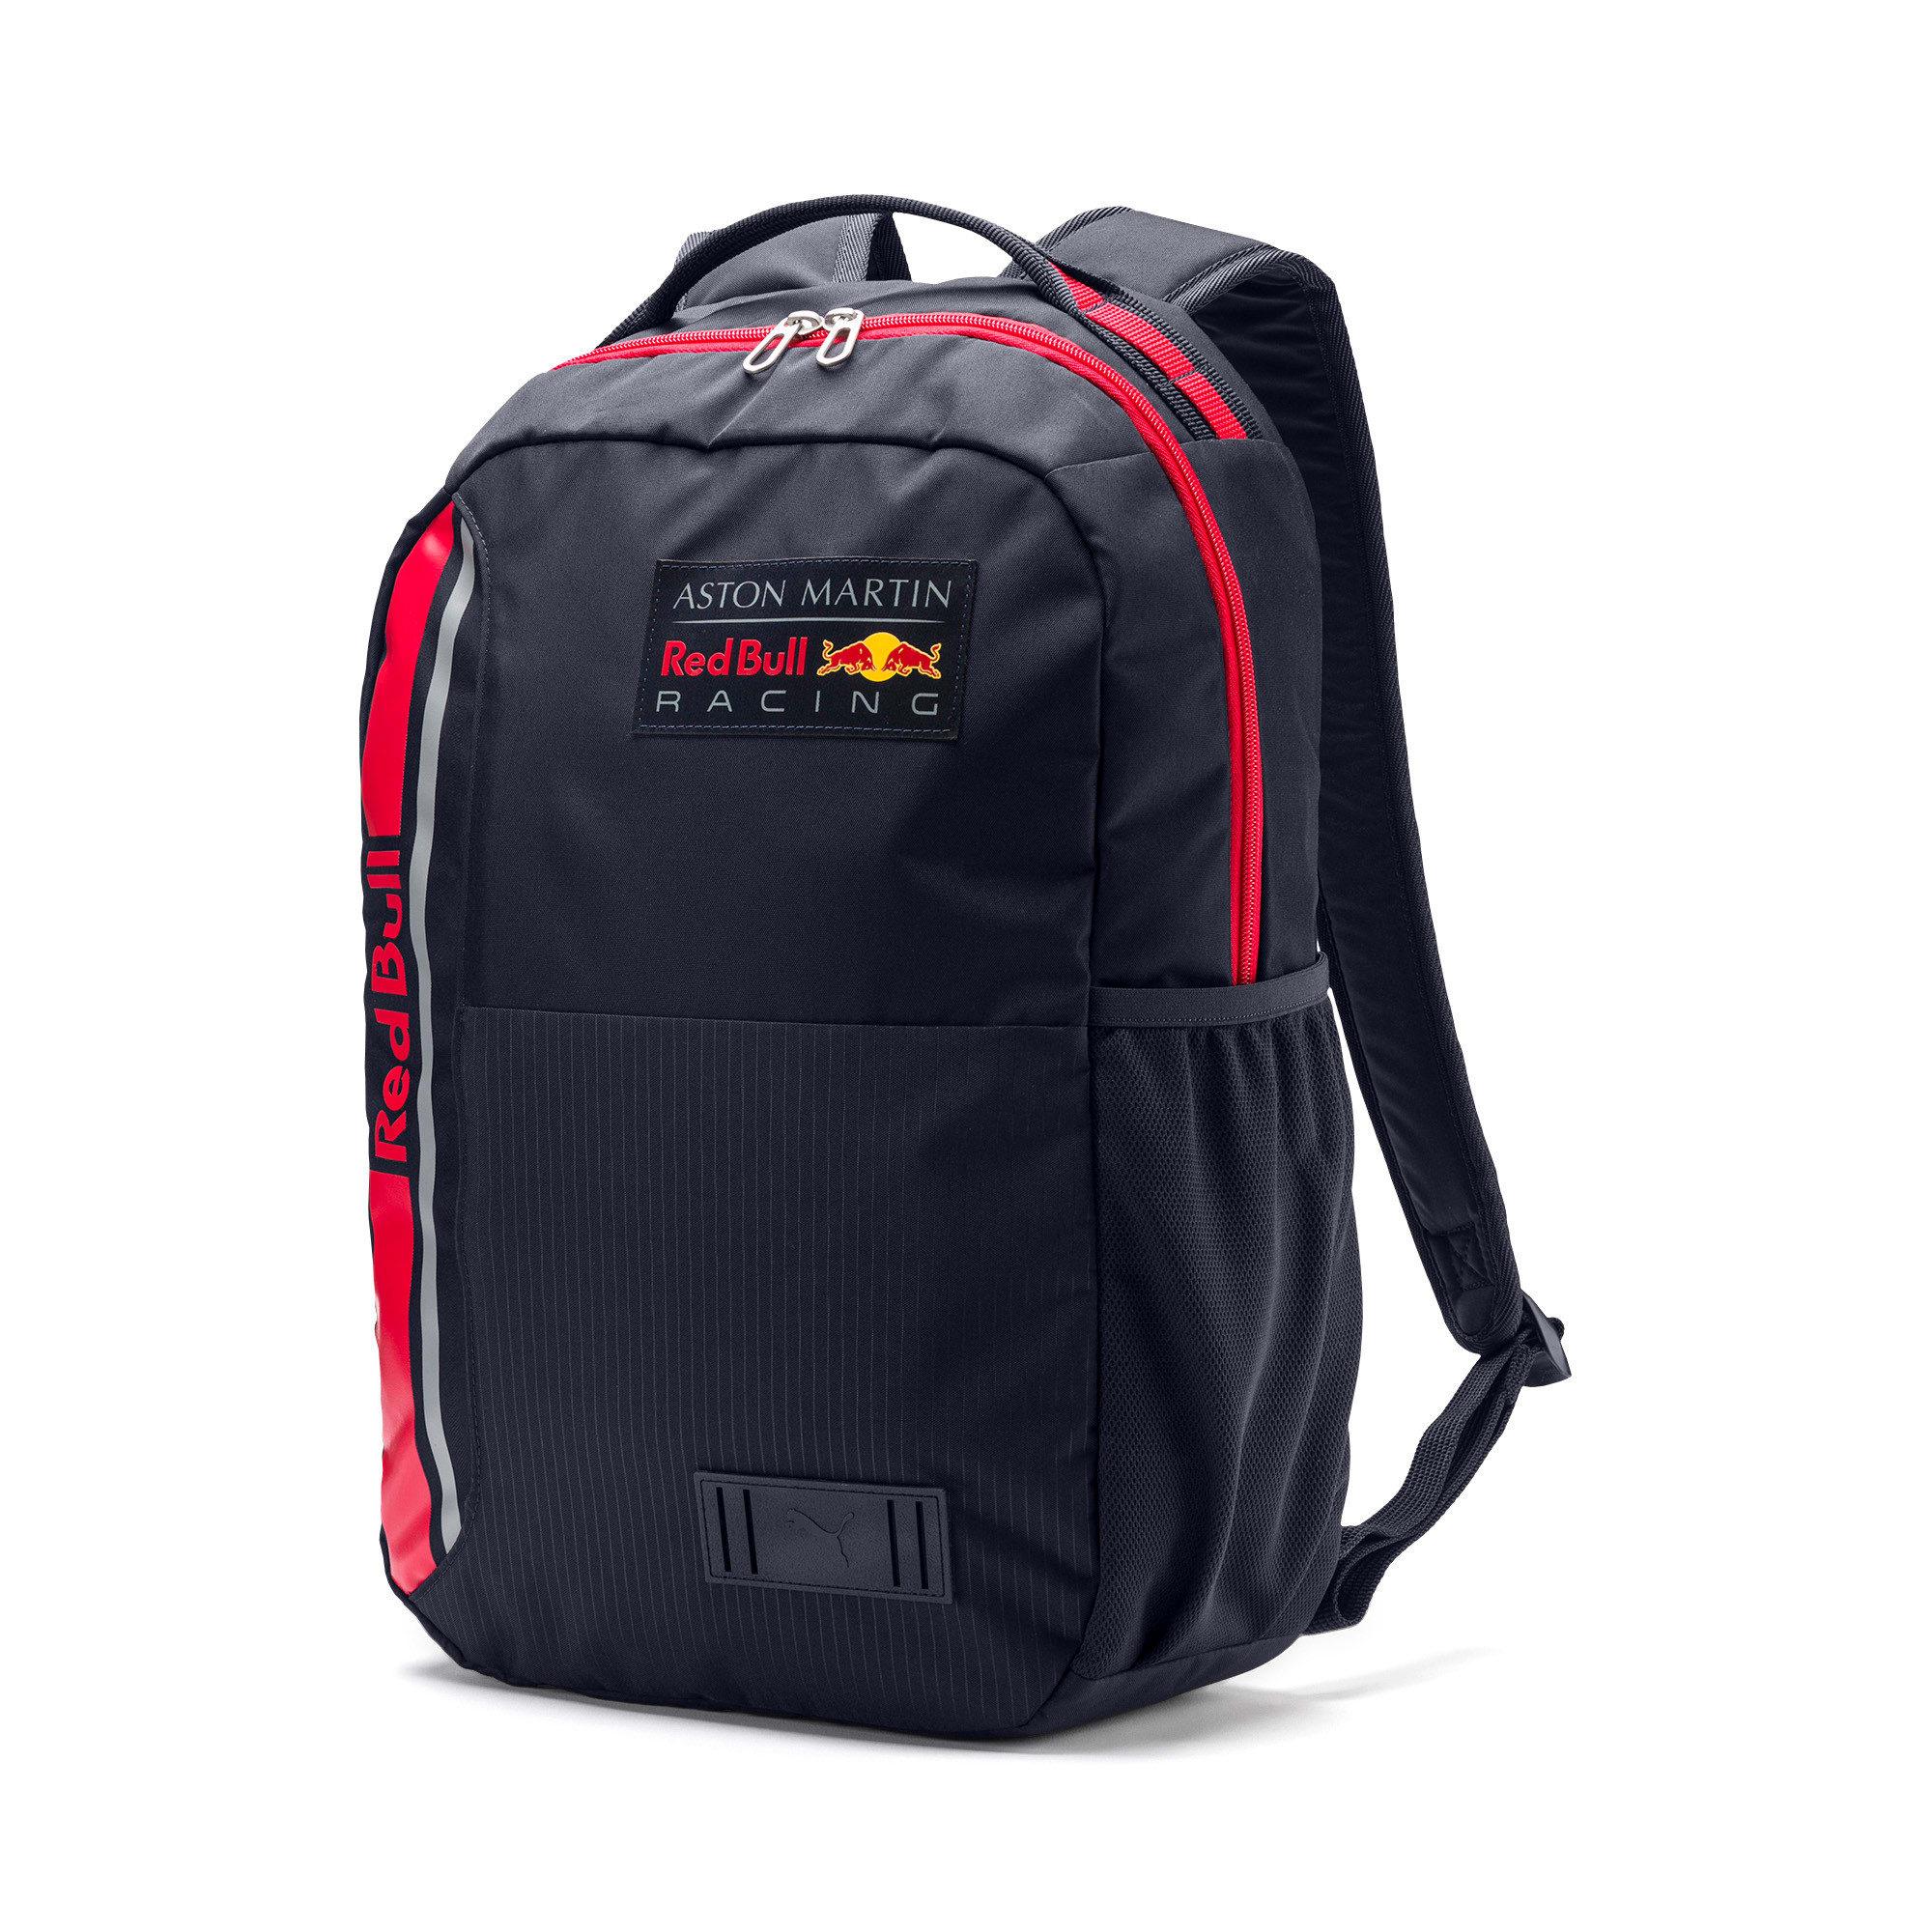 Thumbnail 1 of AM Red Bull Racing Replica Backpack, NIGHT SKY, medium